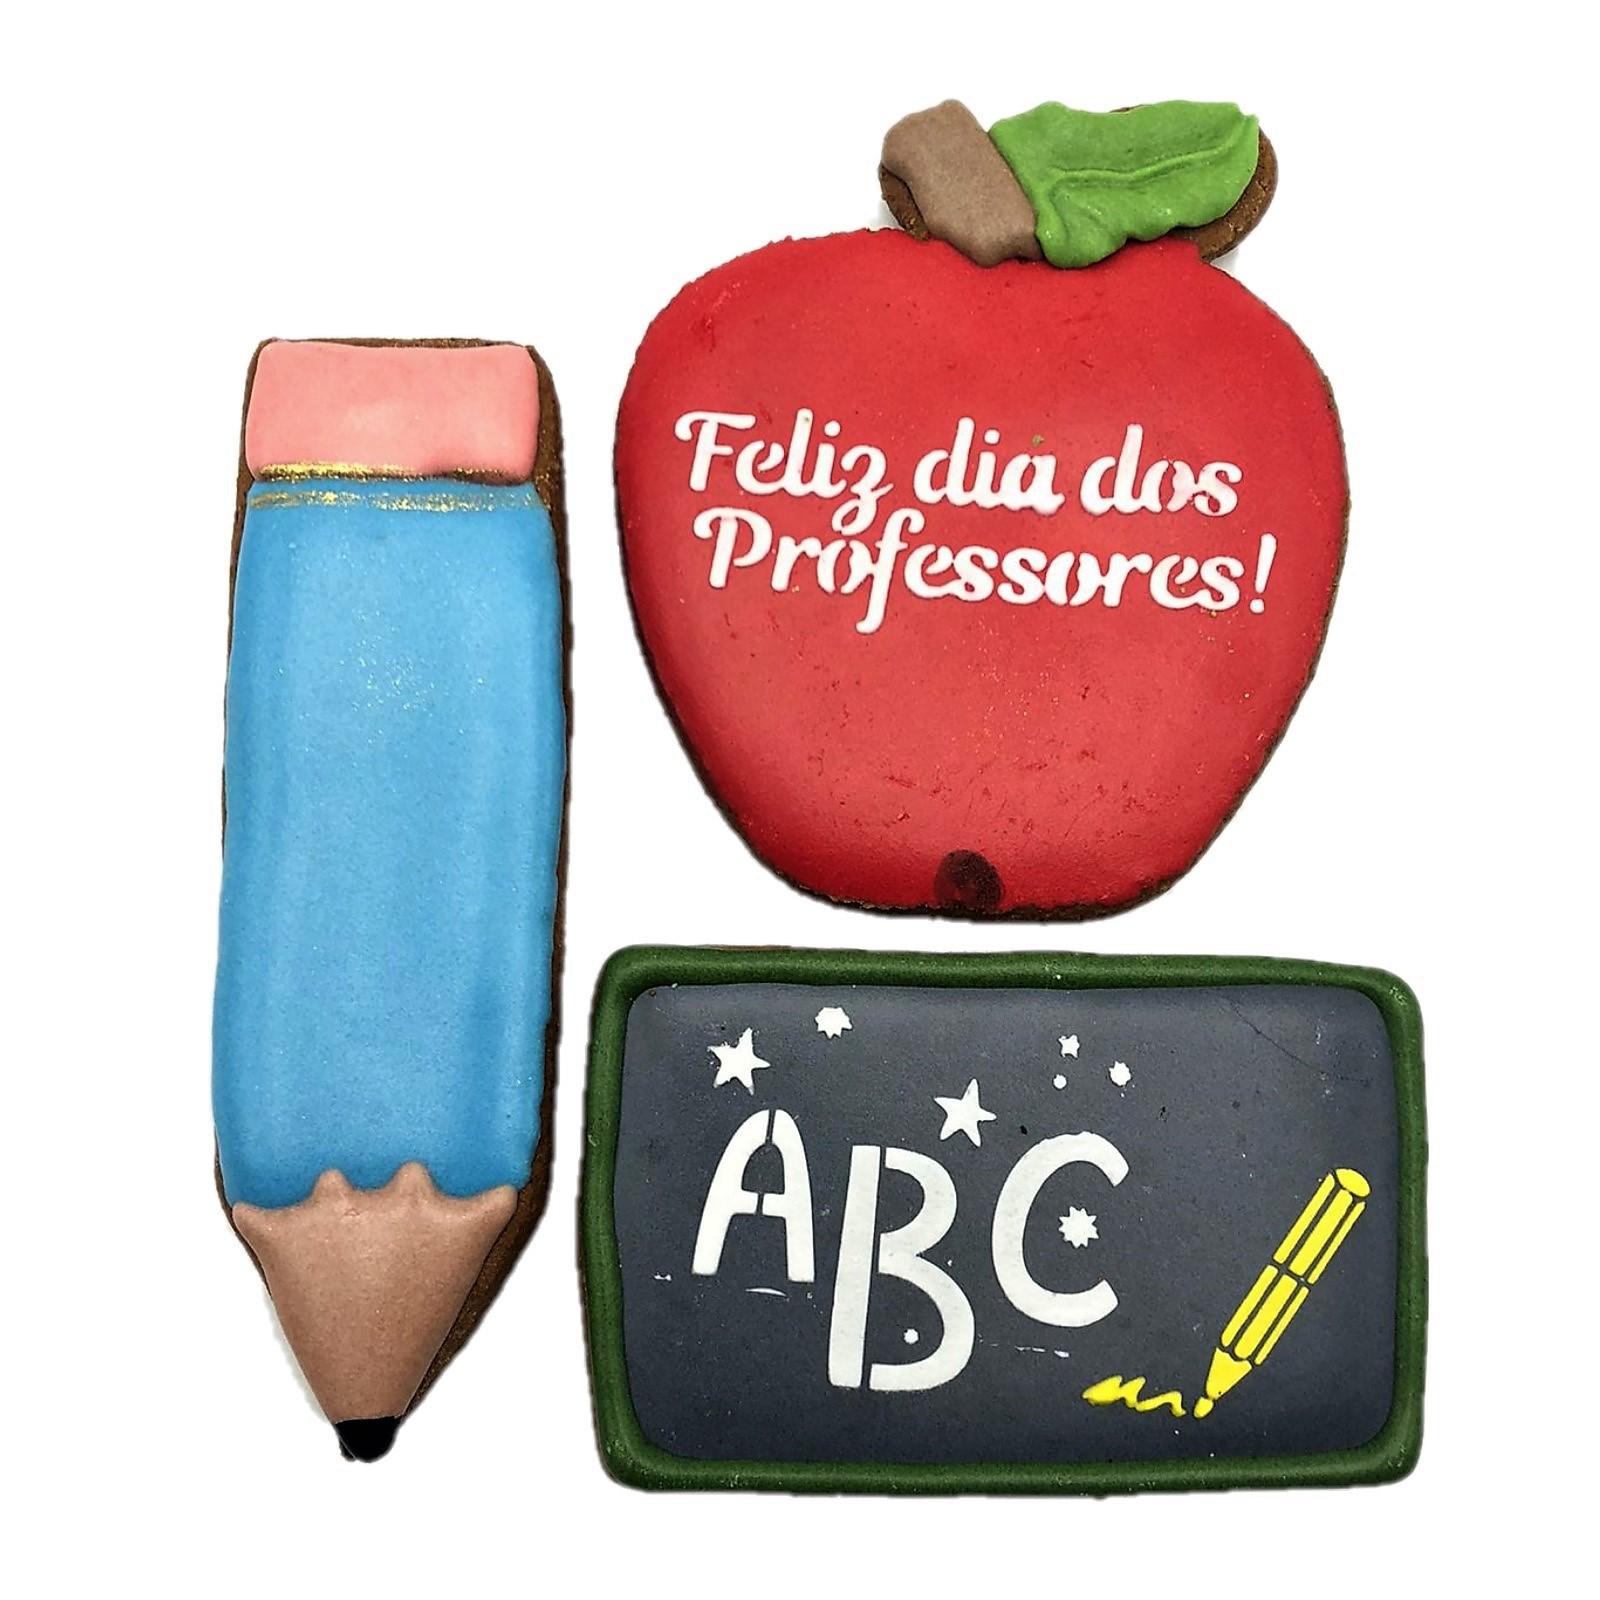 Kit de Bolacha de Mel Confeitada - Dia dos Professores L